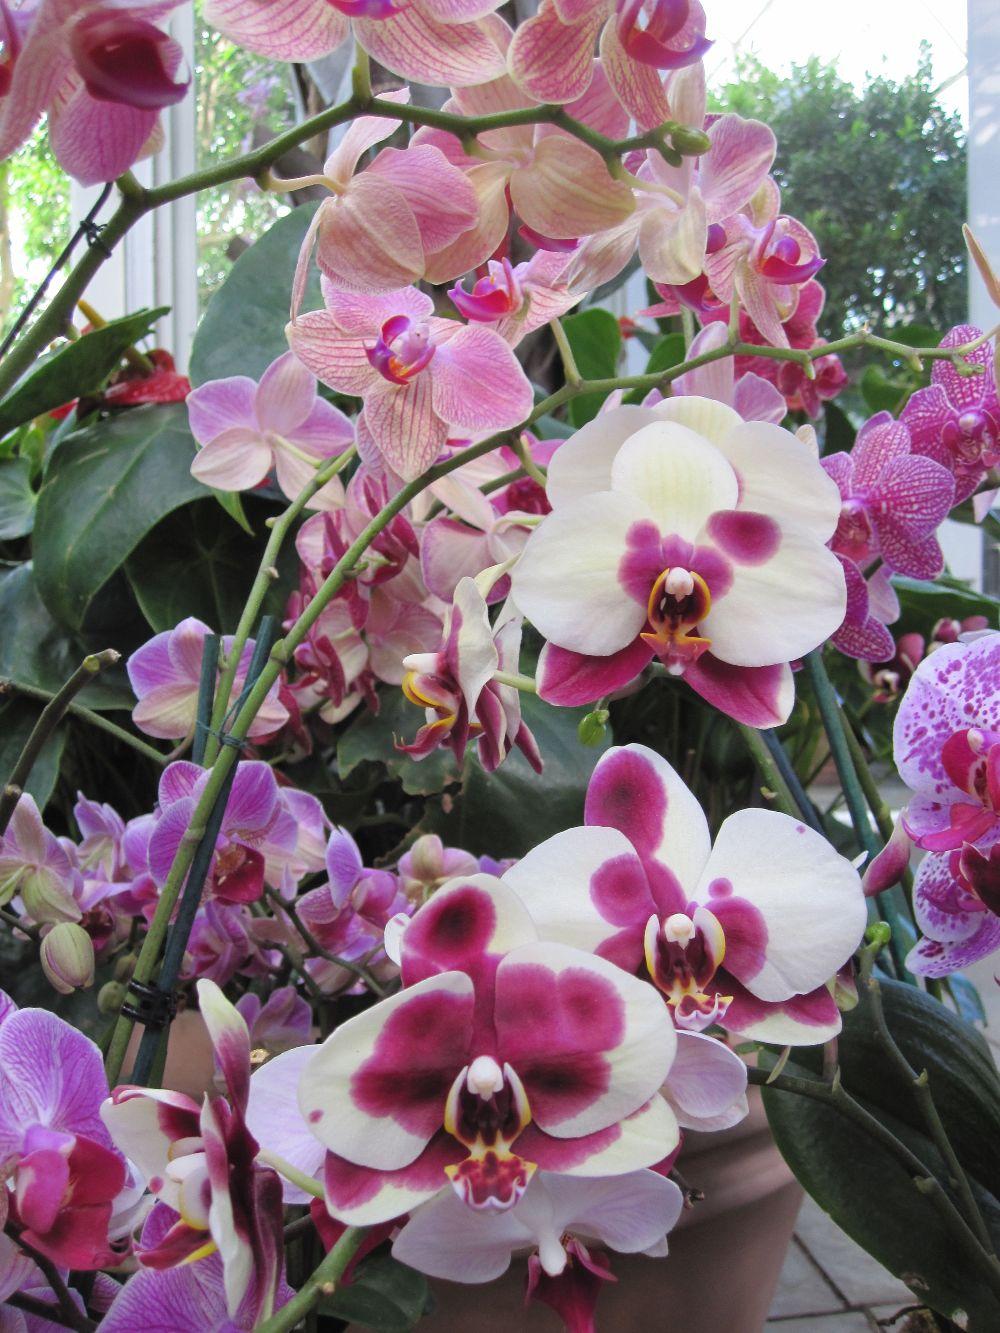 adelaparvu.com despre tratamentul pentru orhideea cu radacini putrezite si frunze ingalbenite, Text Carli Marian (4)